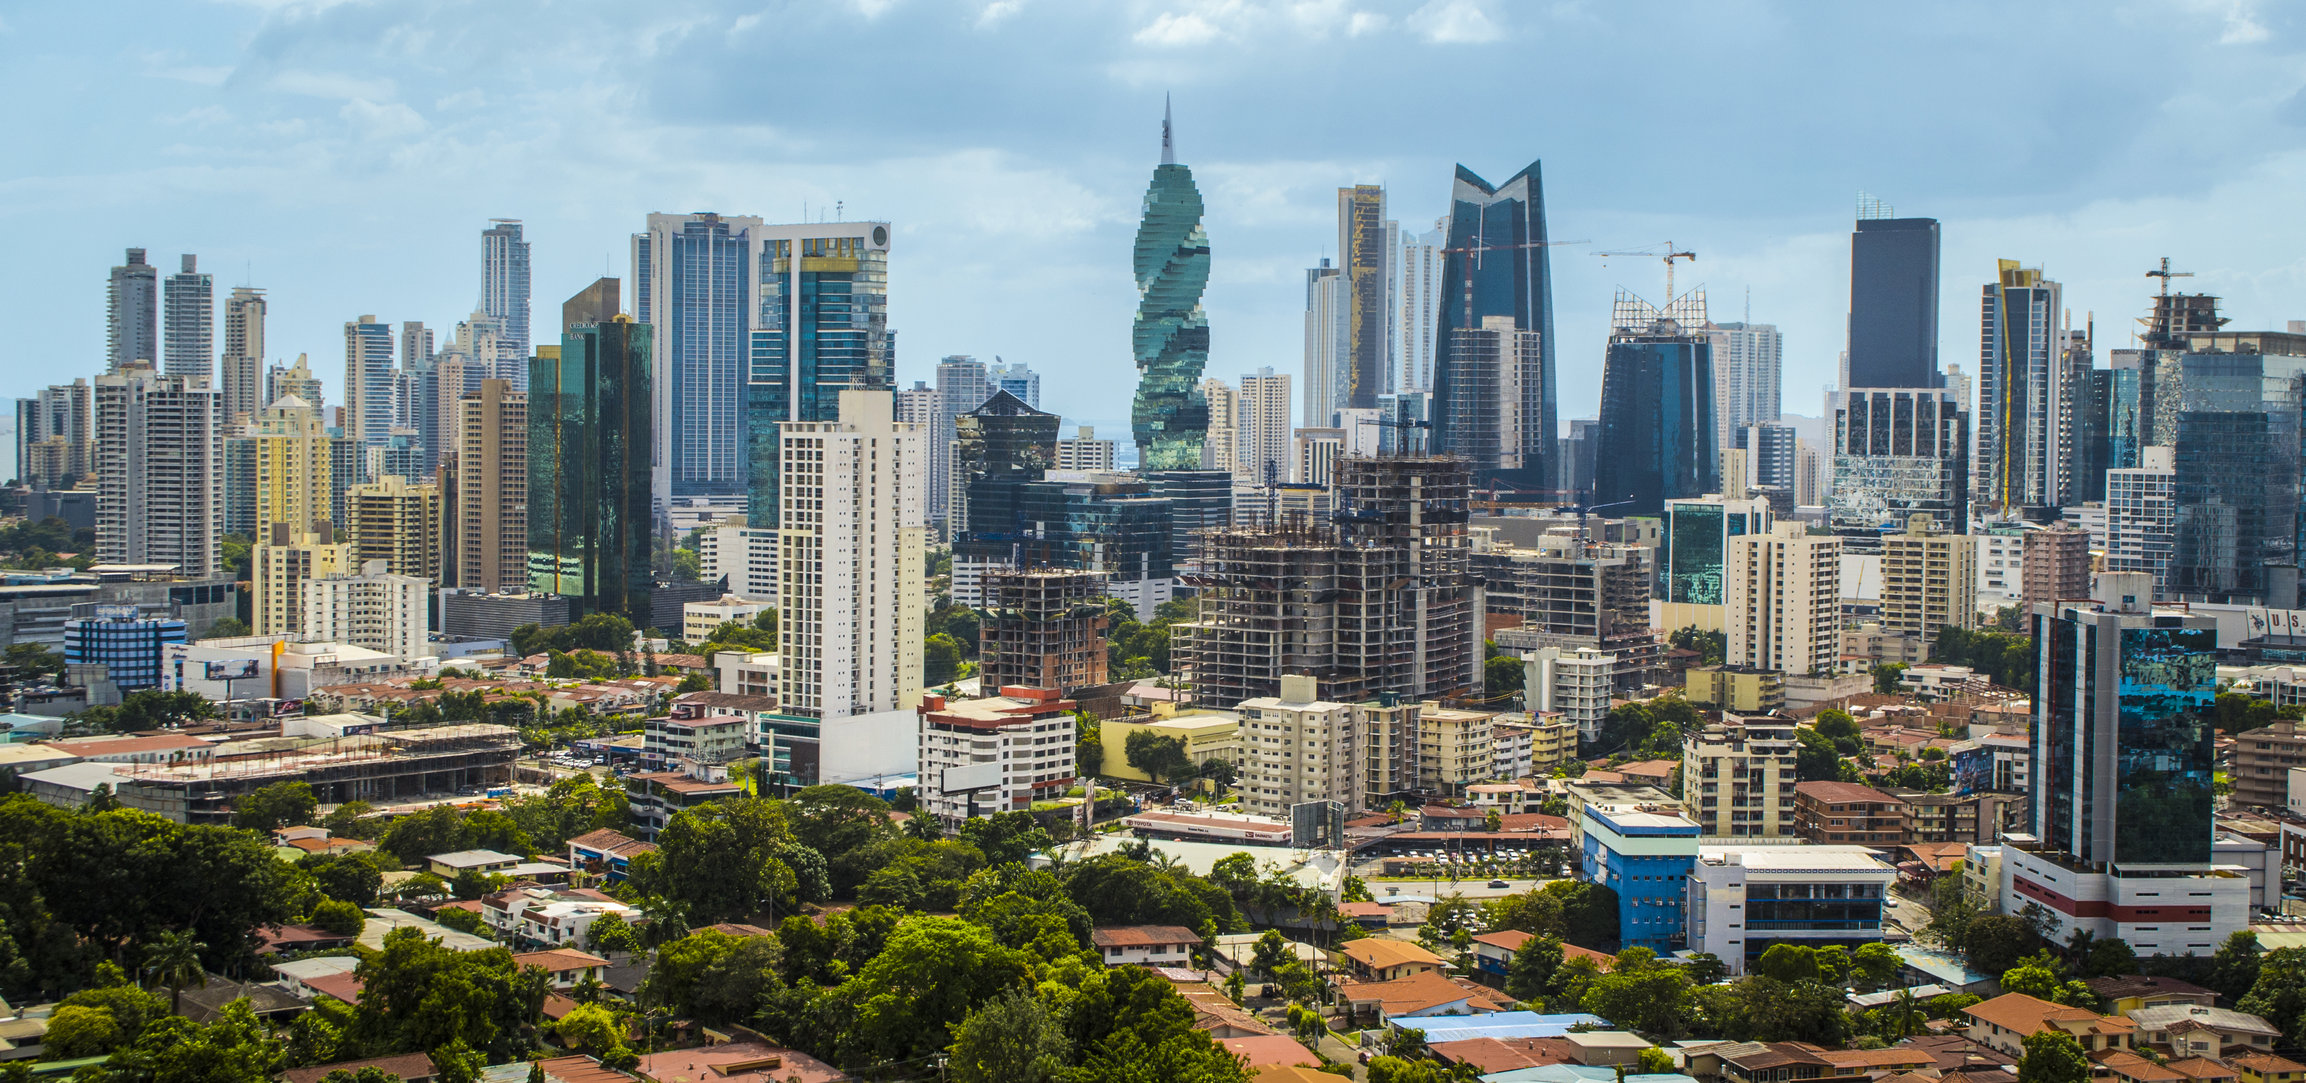 Panama City Beach skyscrapers